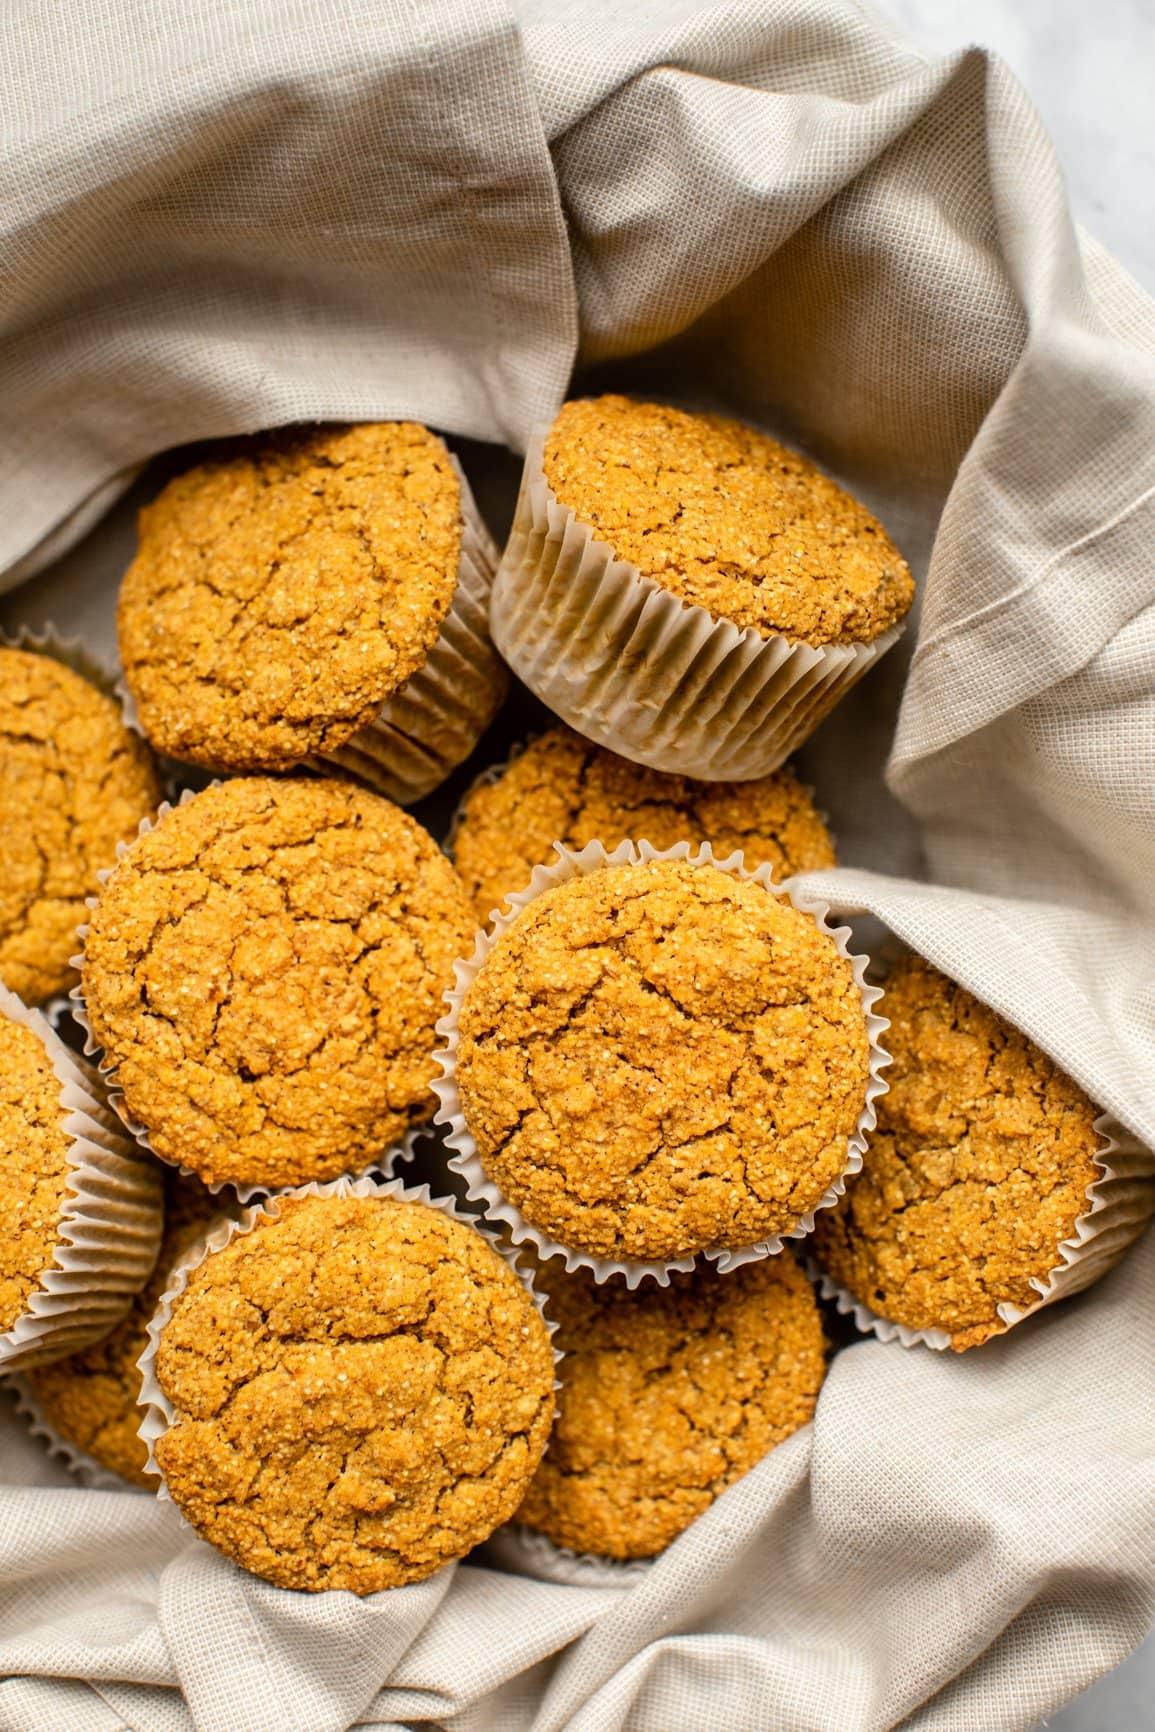 napkin-lined basket full of pumpkin muffins